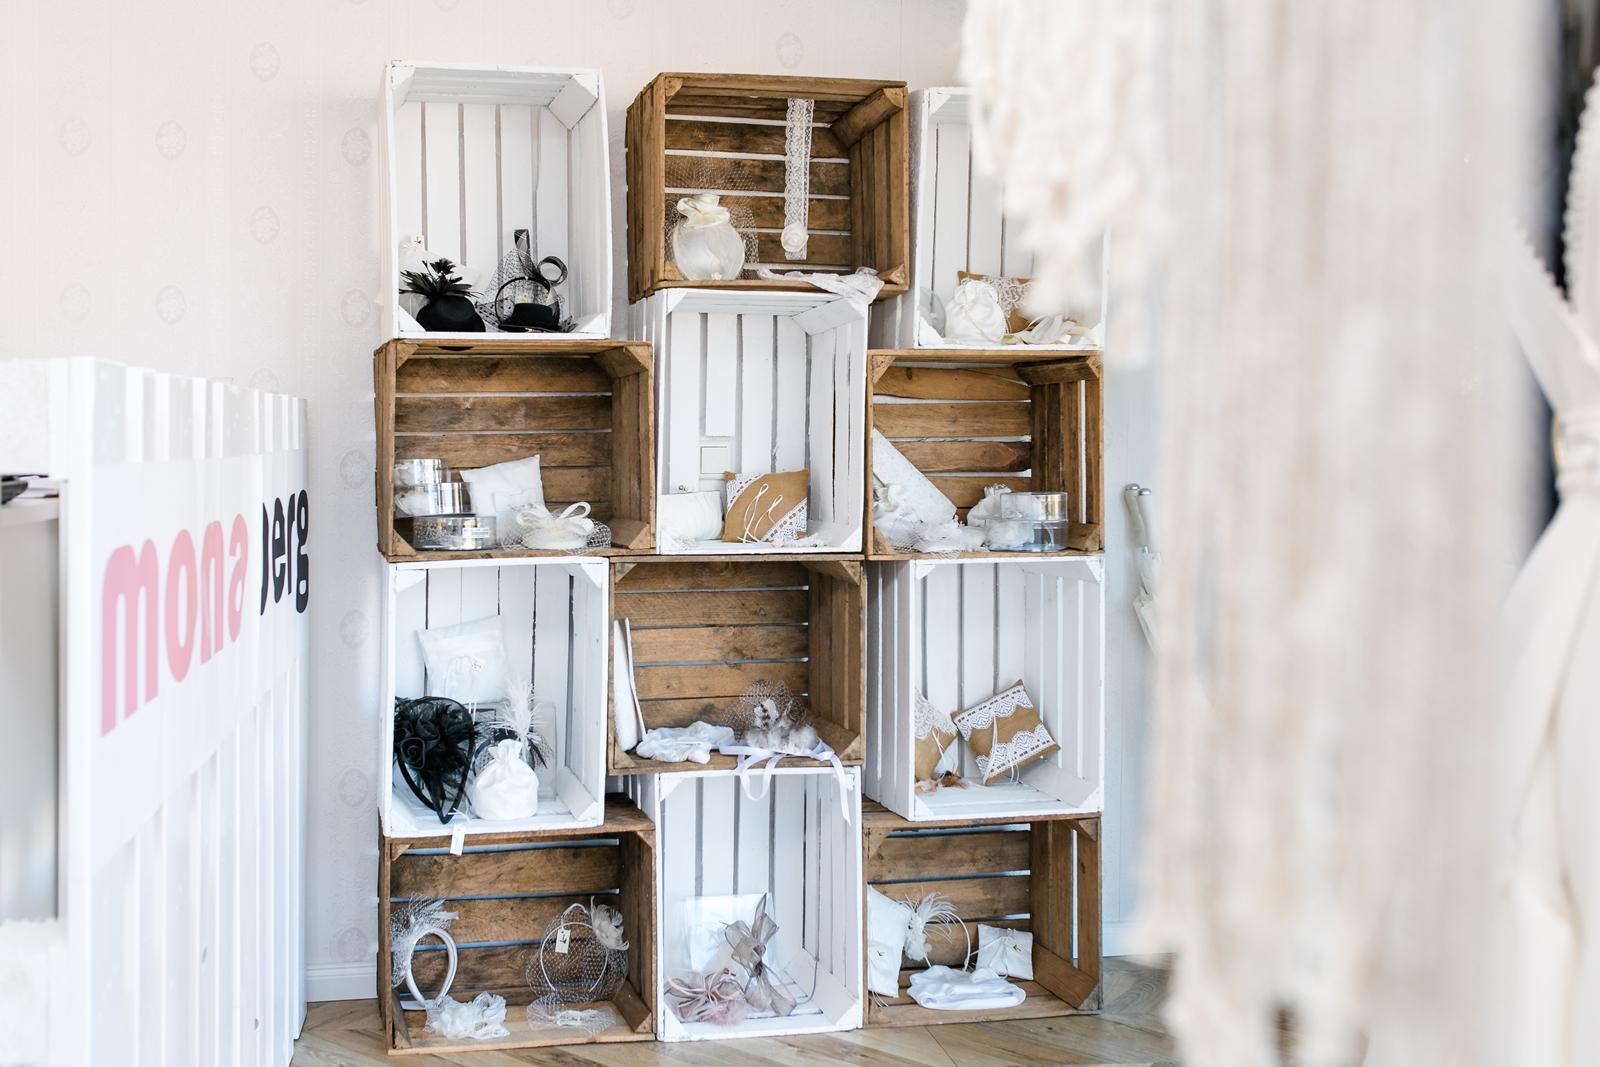 Bridal-Store-Brautkleider-Shop-Atelier-mona-berg-Brautkleider-Hamburg-Brautmode-vintage-boho-14